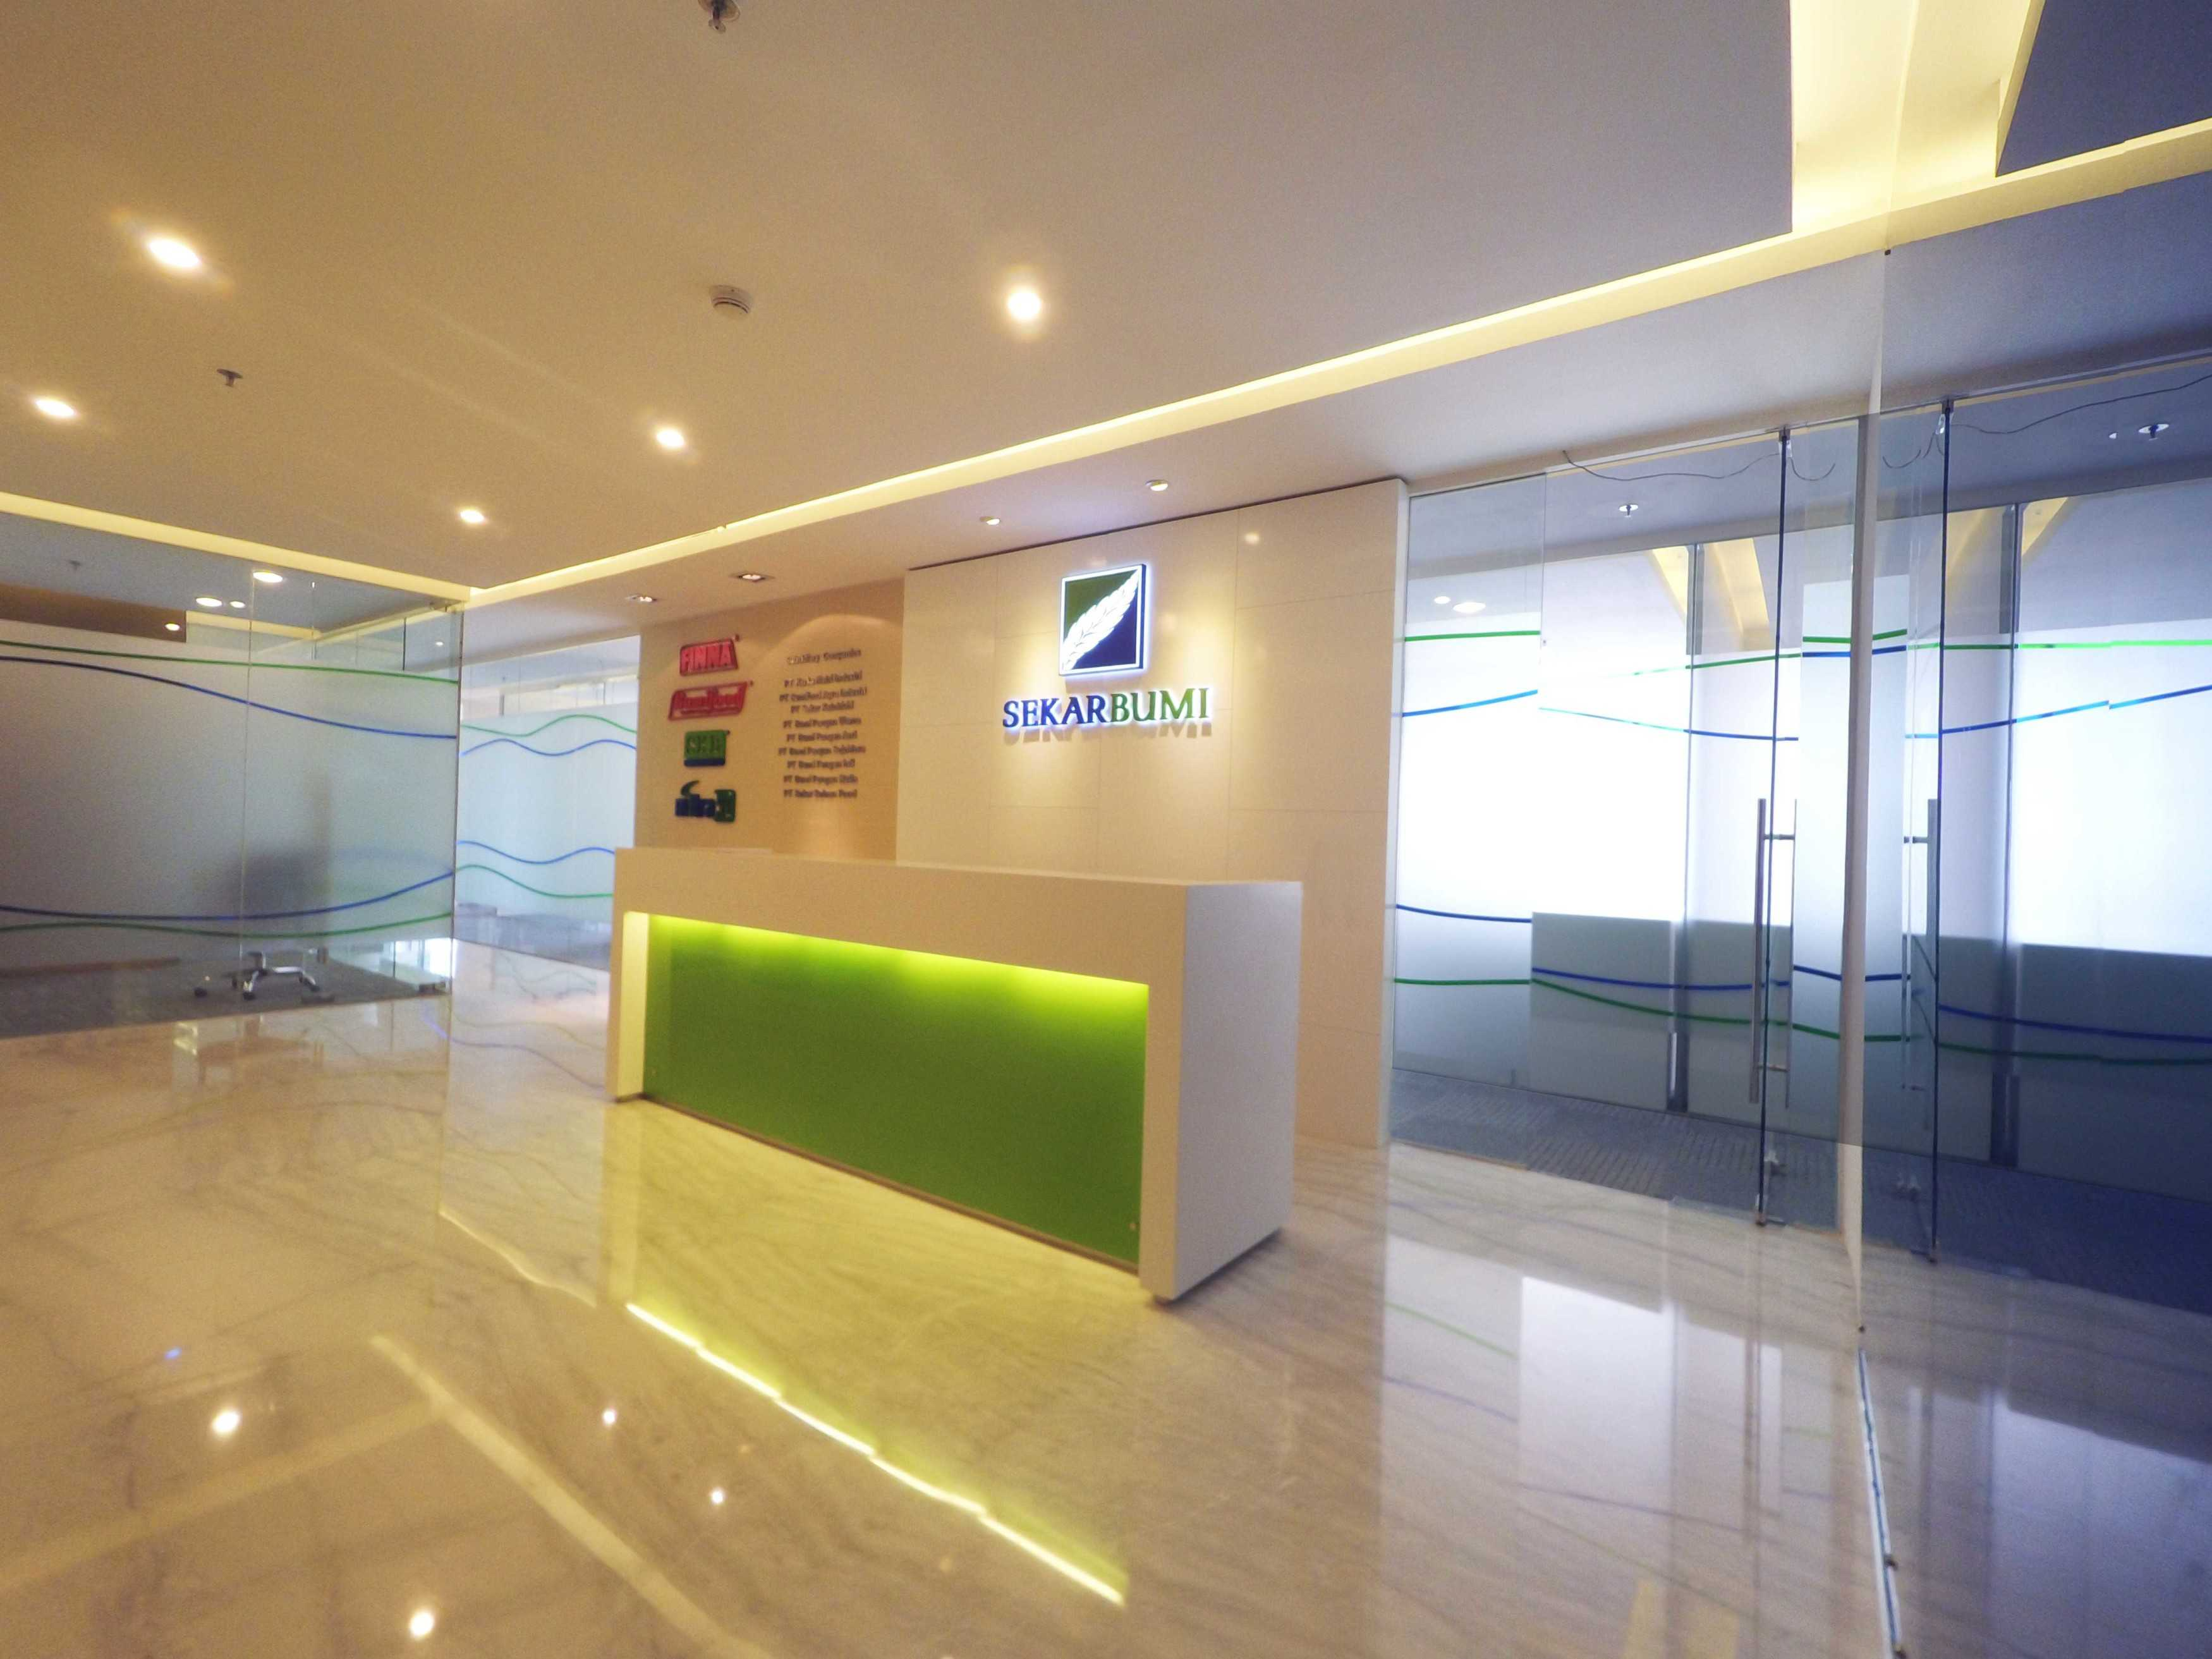 Arkadia Works Sekar Bumi Office Renovation Plaza Asia 21St Floor Plaza Asia 21St Floor Receptionist   14071